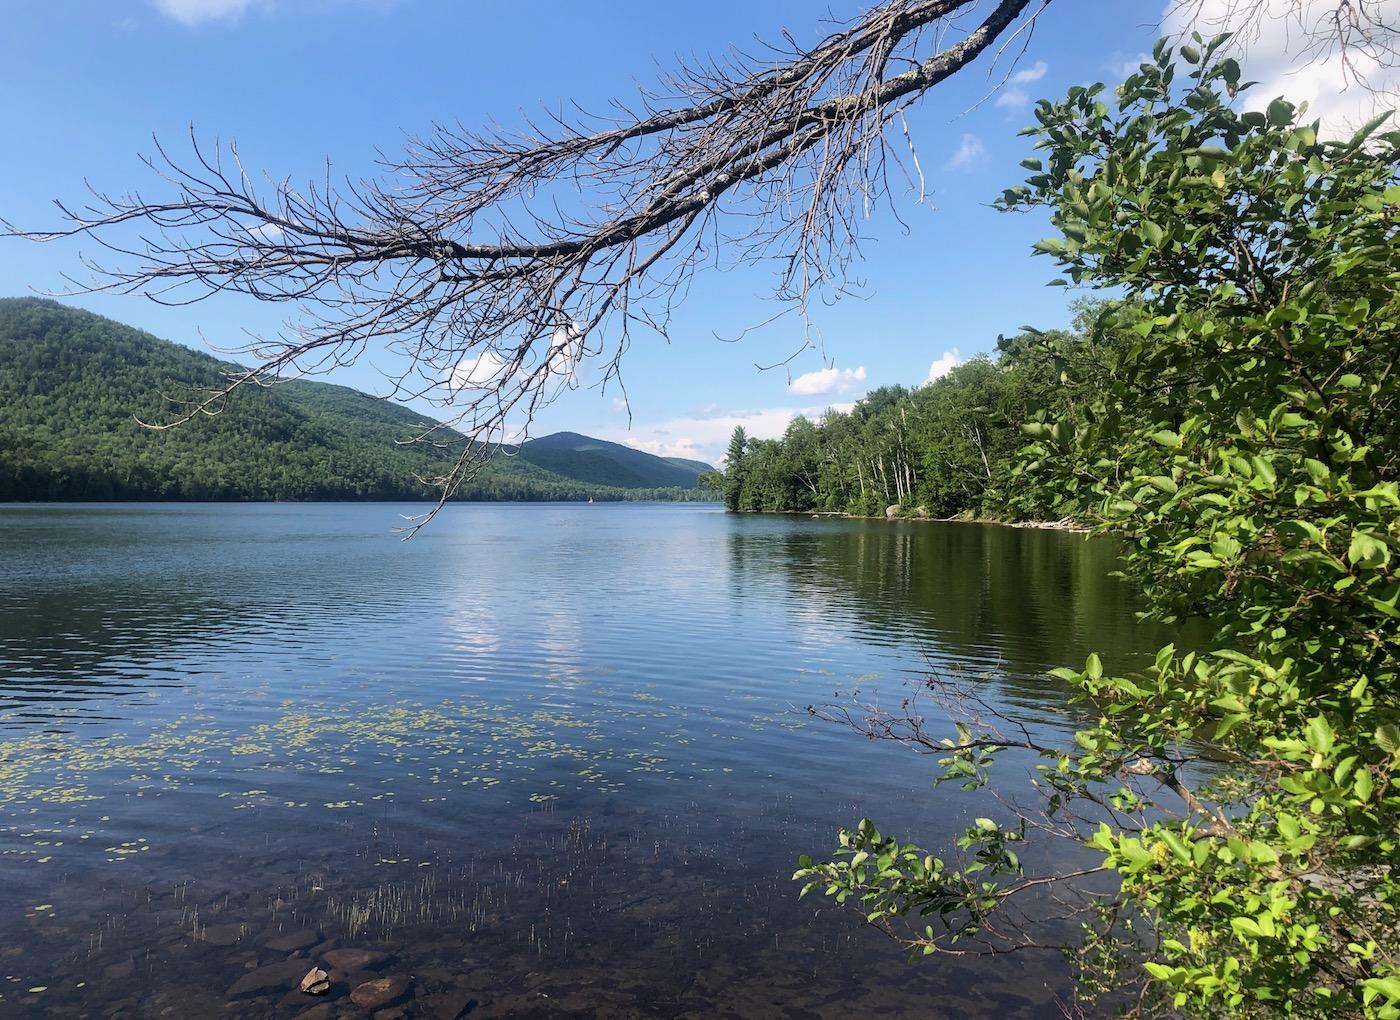 sunny day on Thirteenth Lake